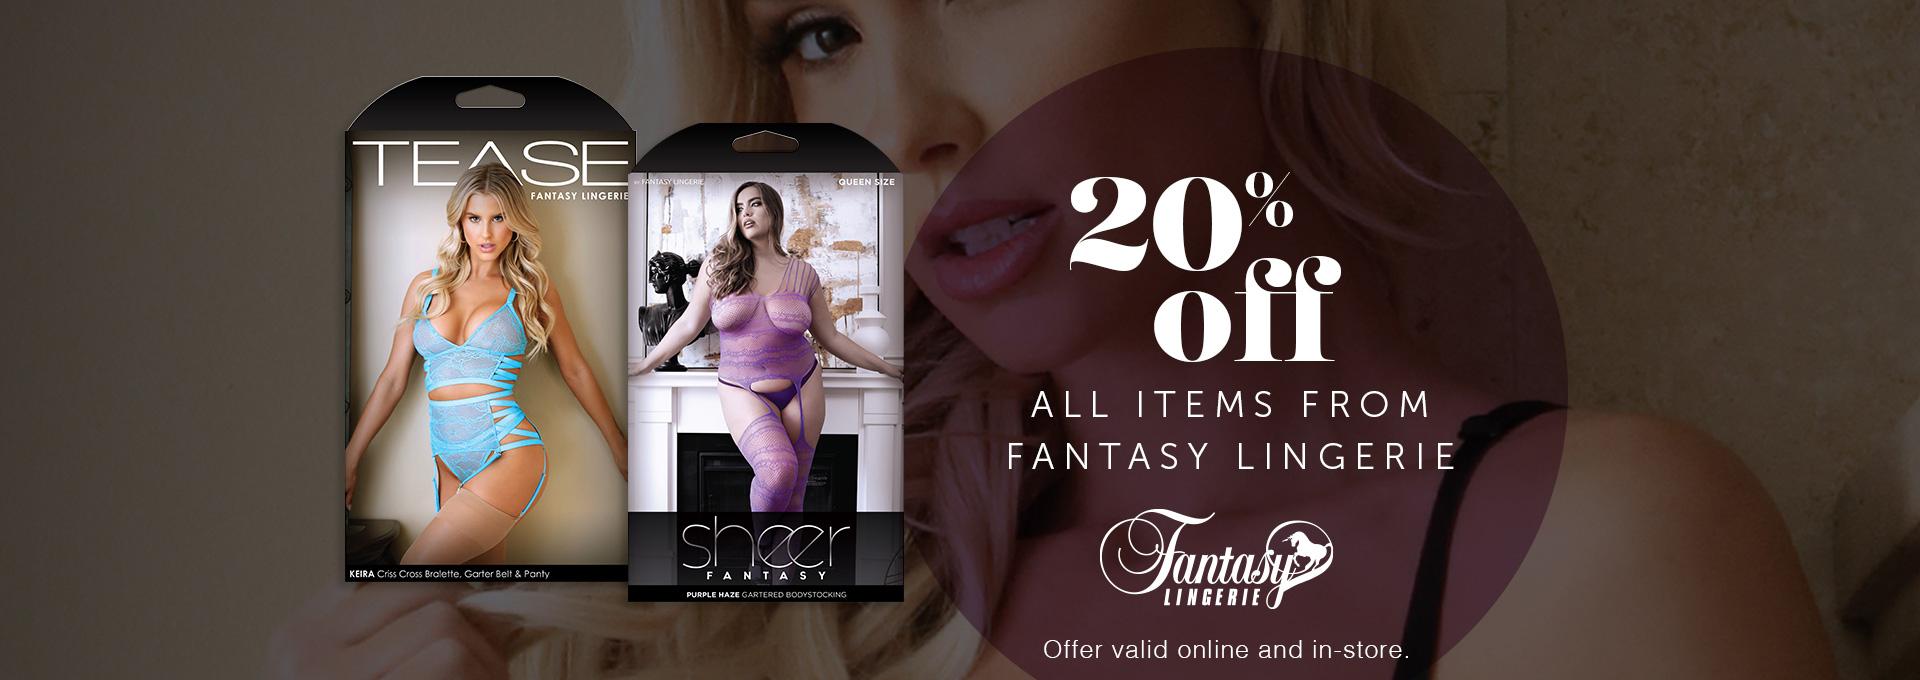 20% OFF All Fantasy Lingerie